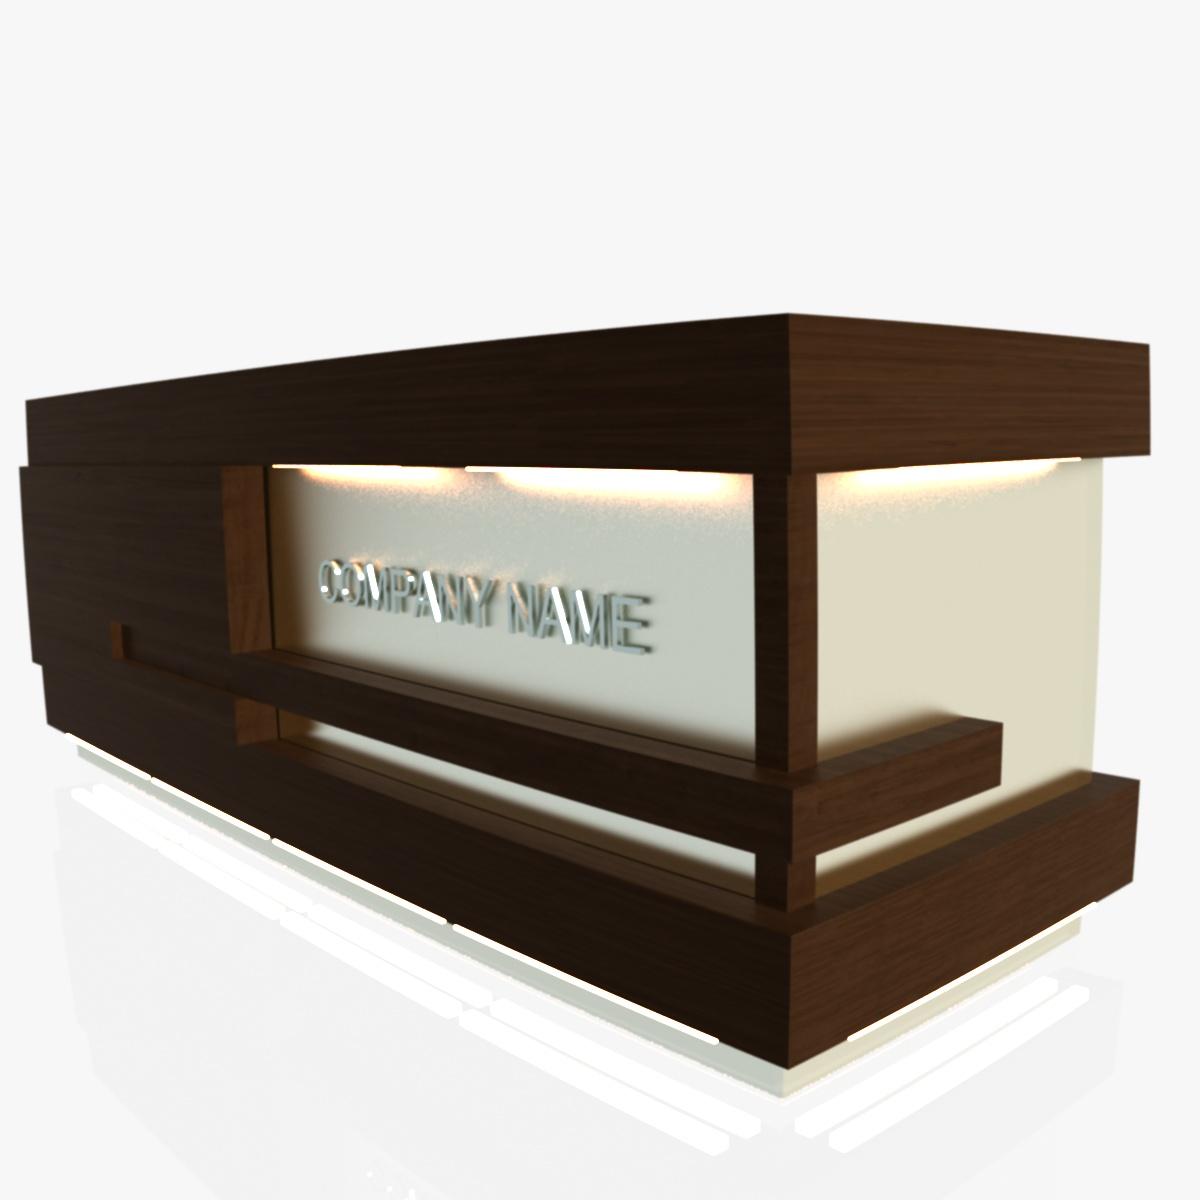 Reception Desk 1 3d model 3ds max dxf fbx  obj 219847